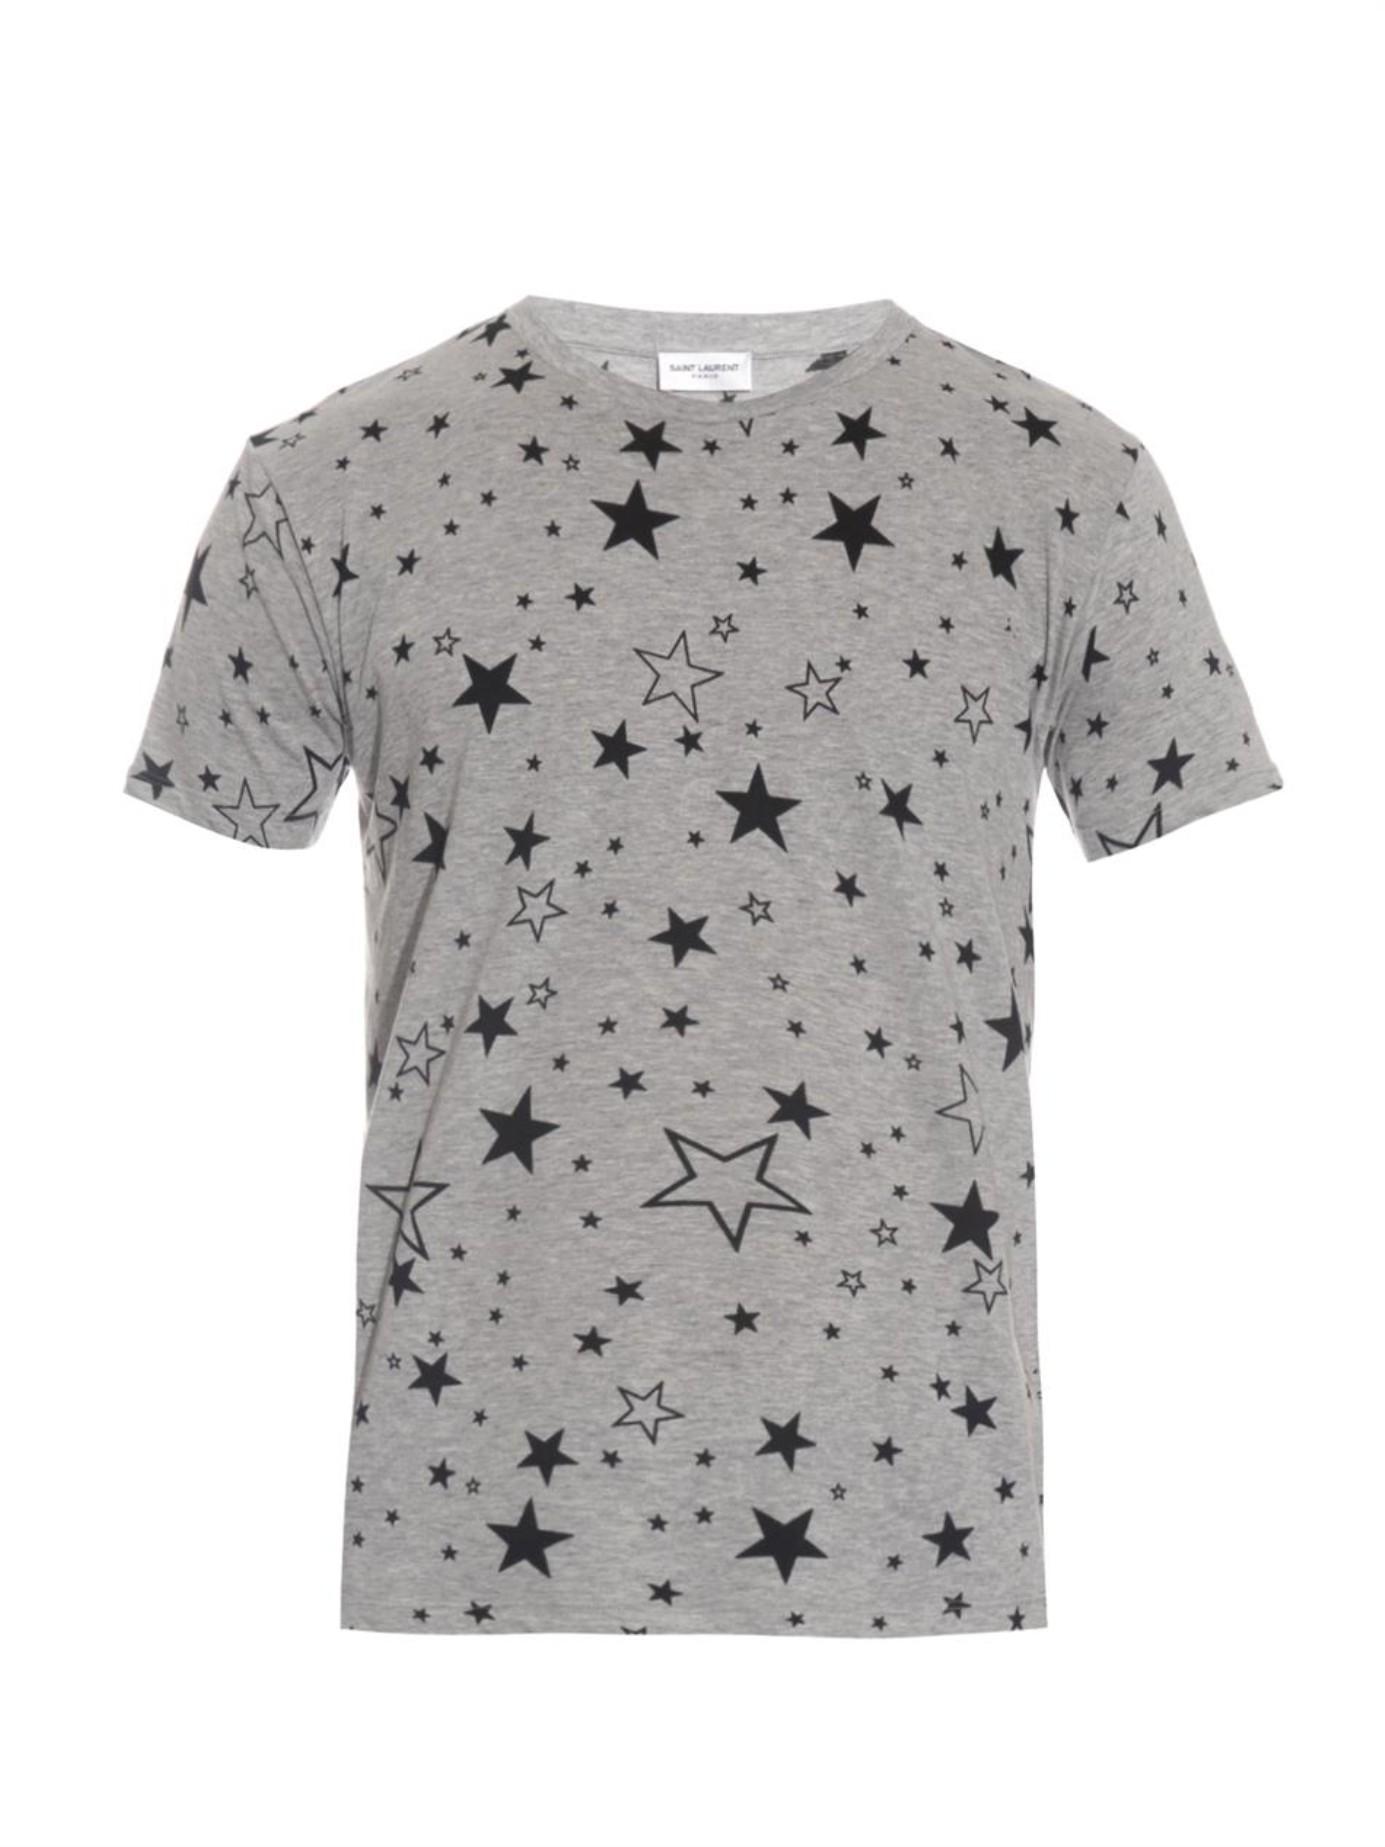 Lyst saint laurent star print t shirt in gray for men for Mens shirt with stars